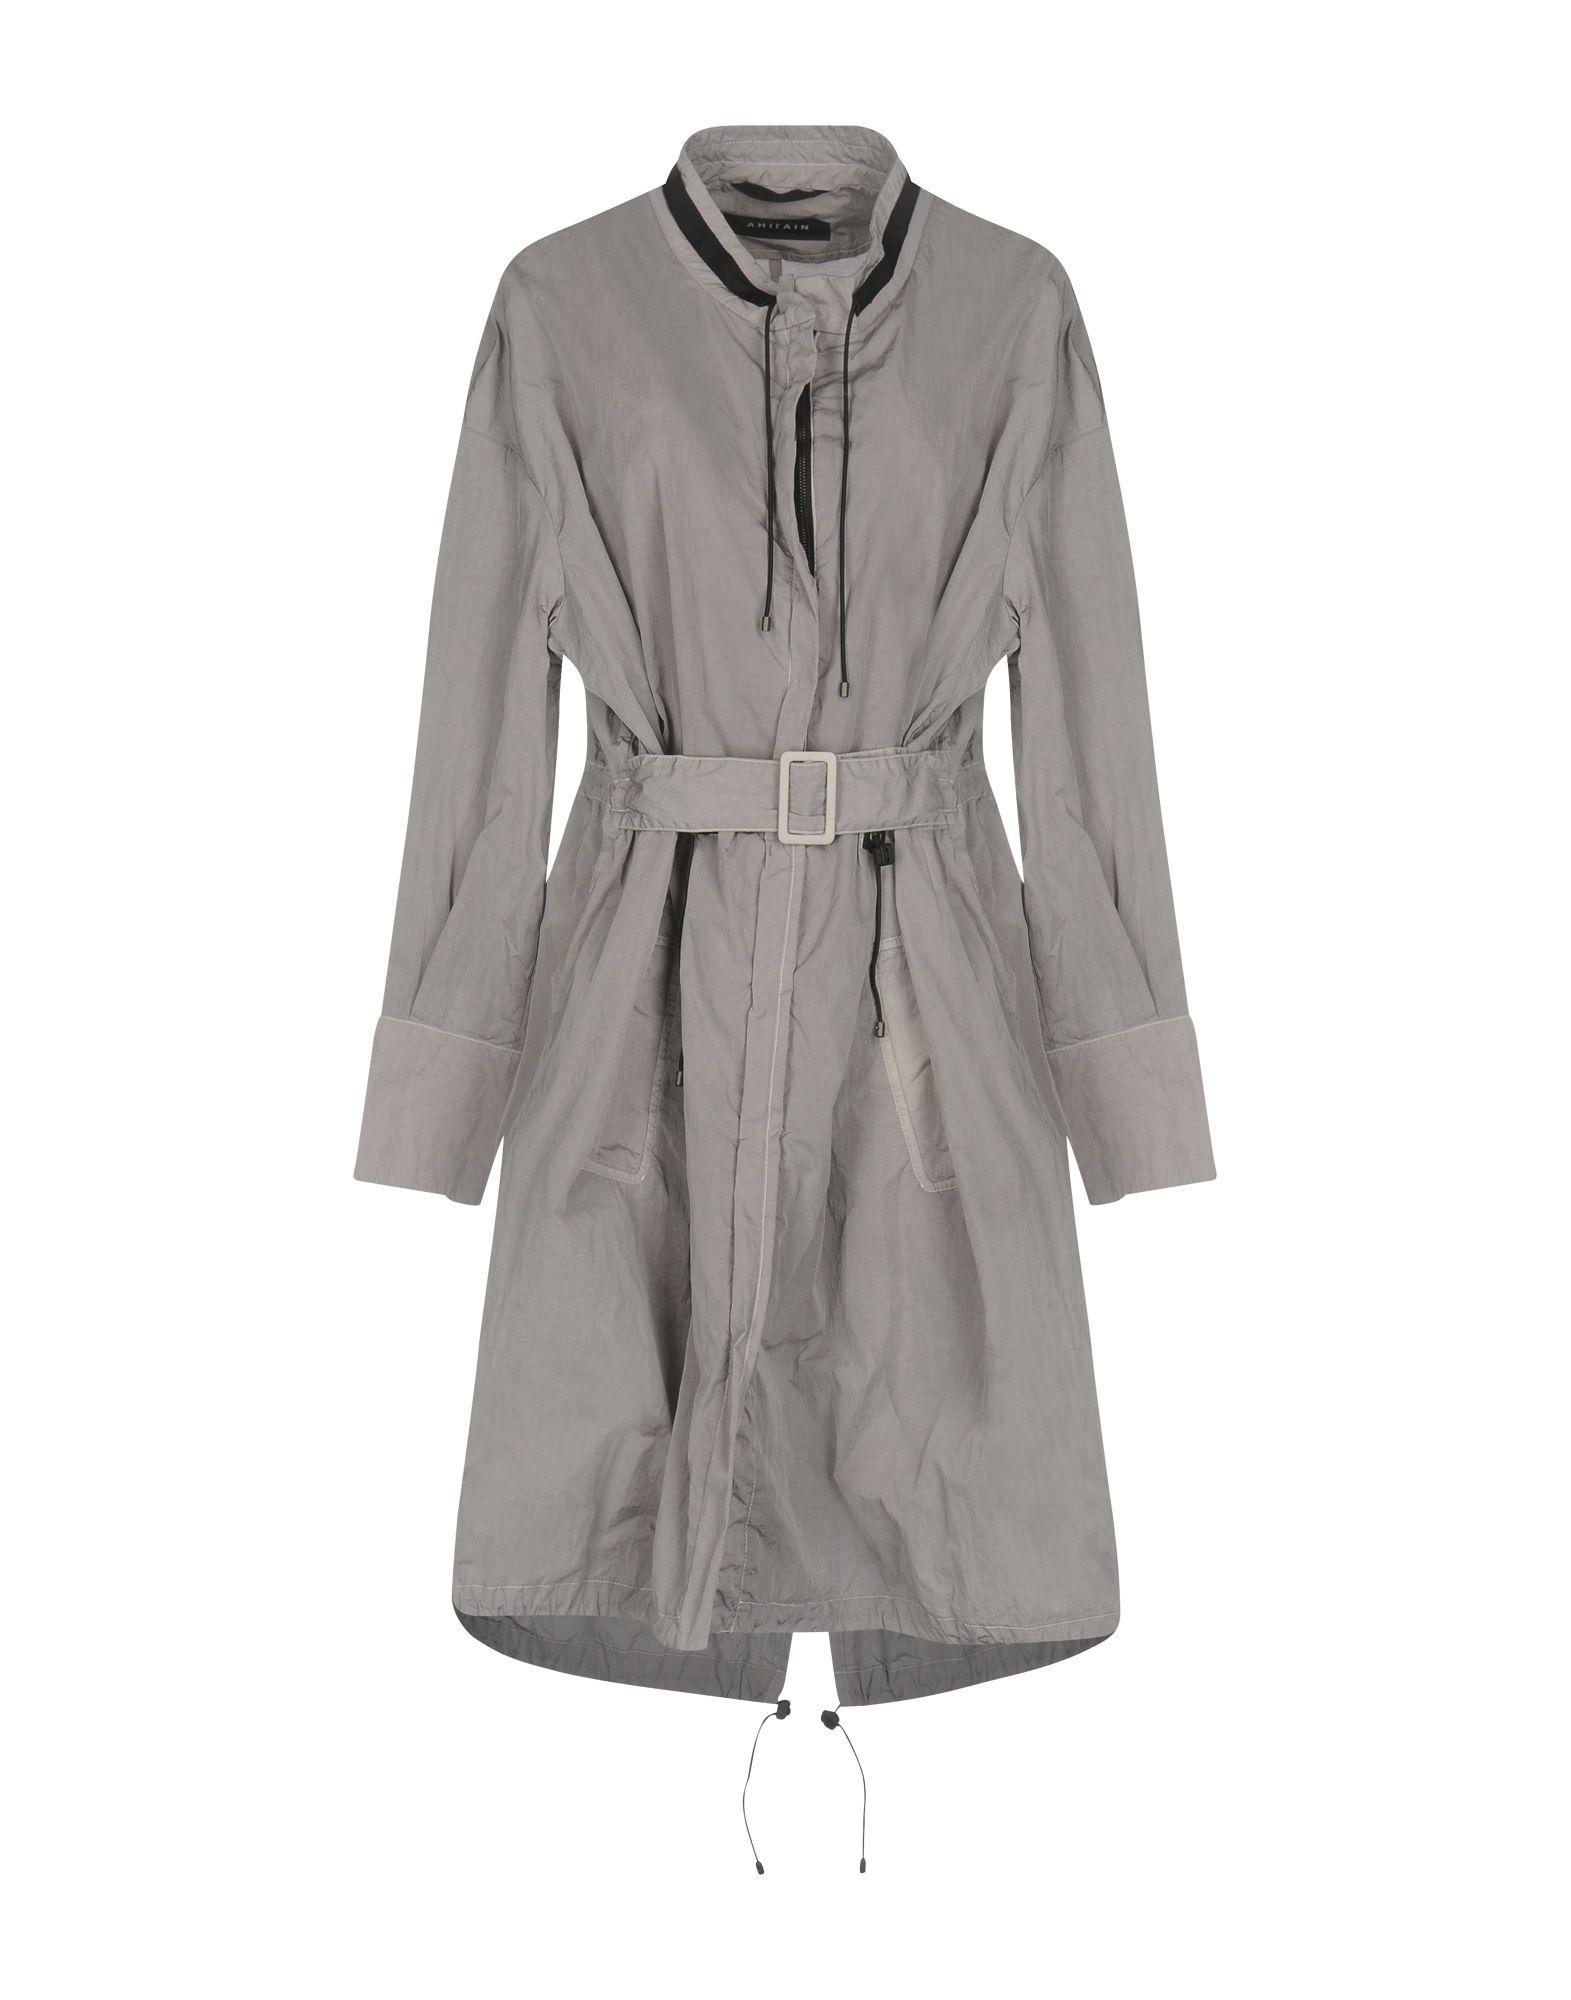 AHIRAIN Full-Length Jacket in Grey